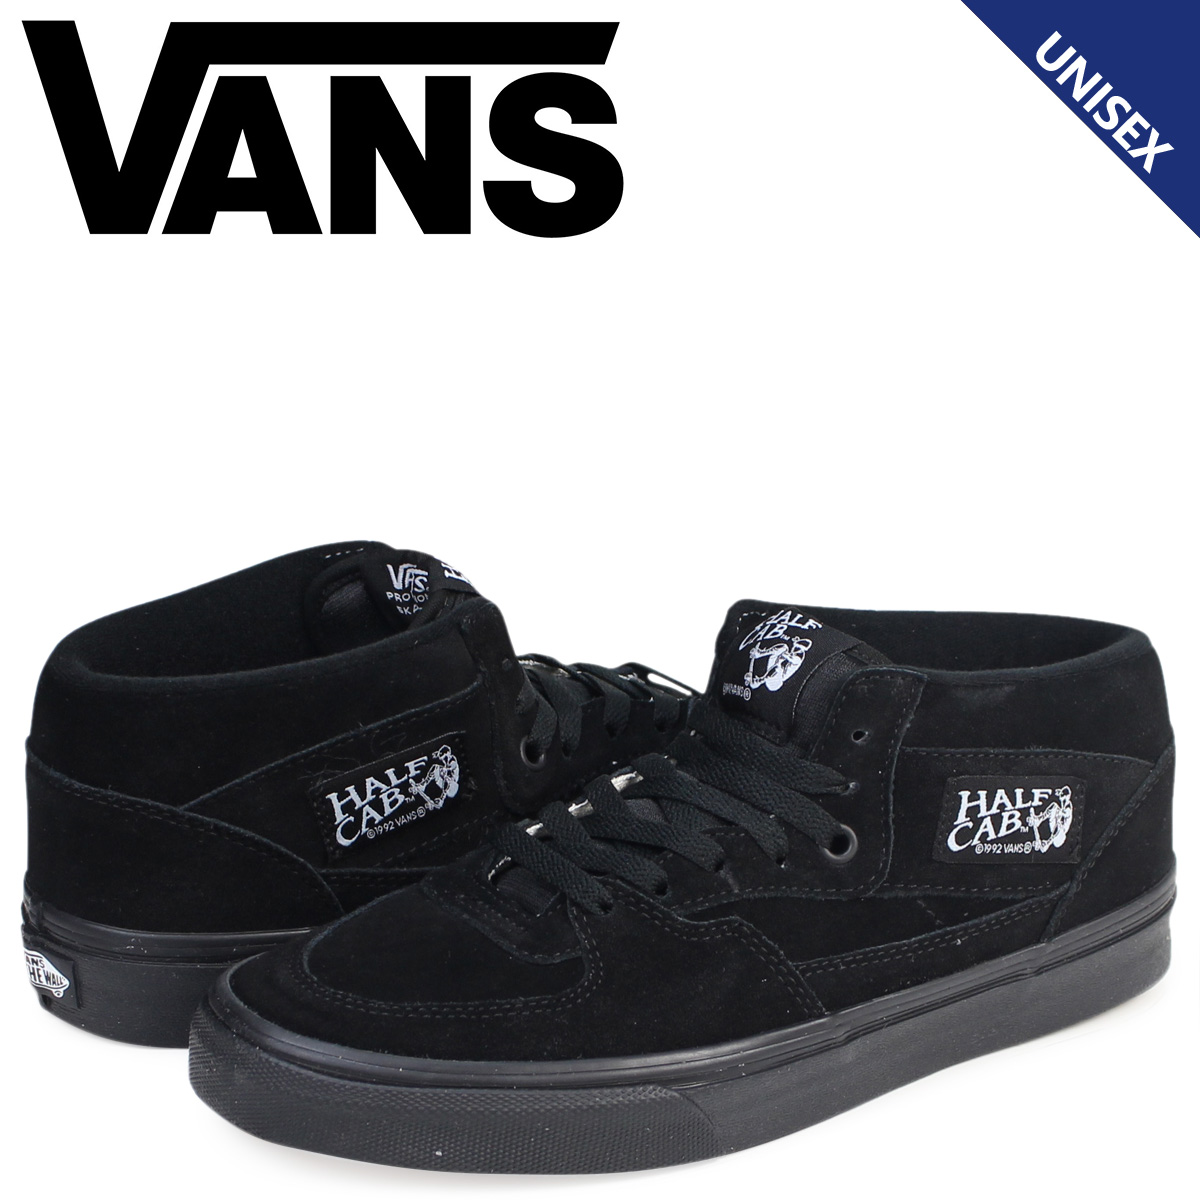 ca29306912 ALLSPORTS  Vans HALF CAB sneakers men gap Dis VANS station wagons ...